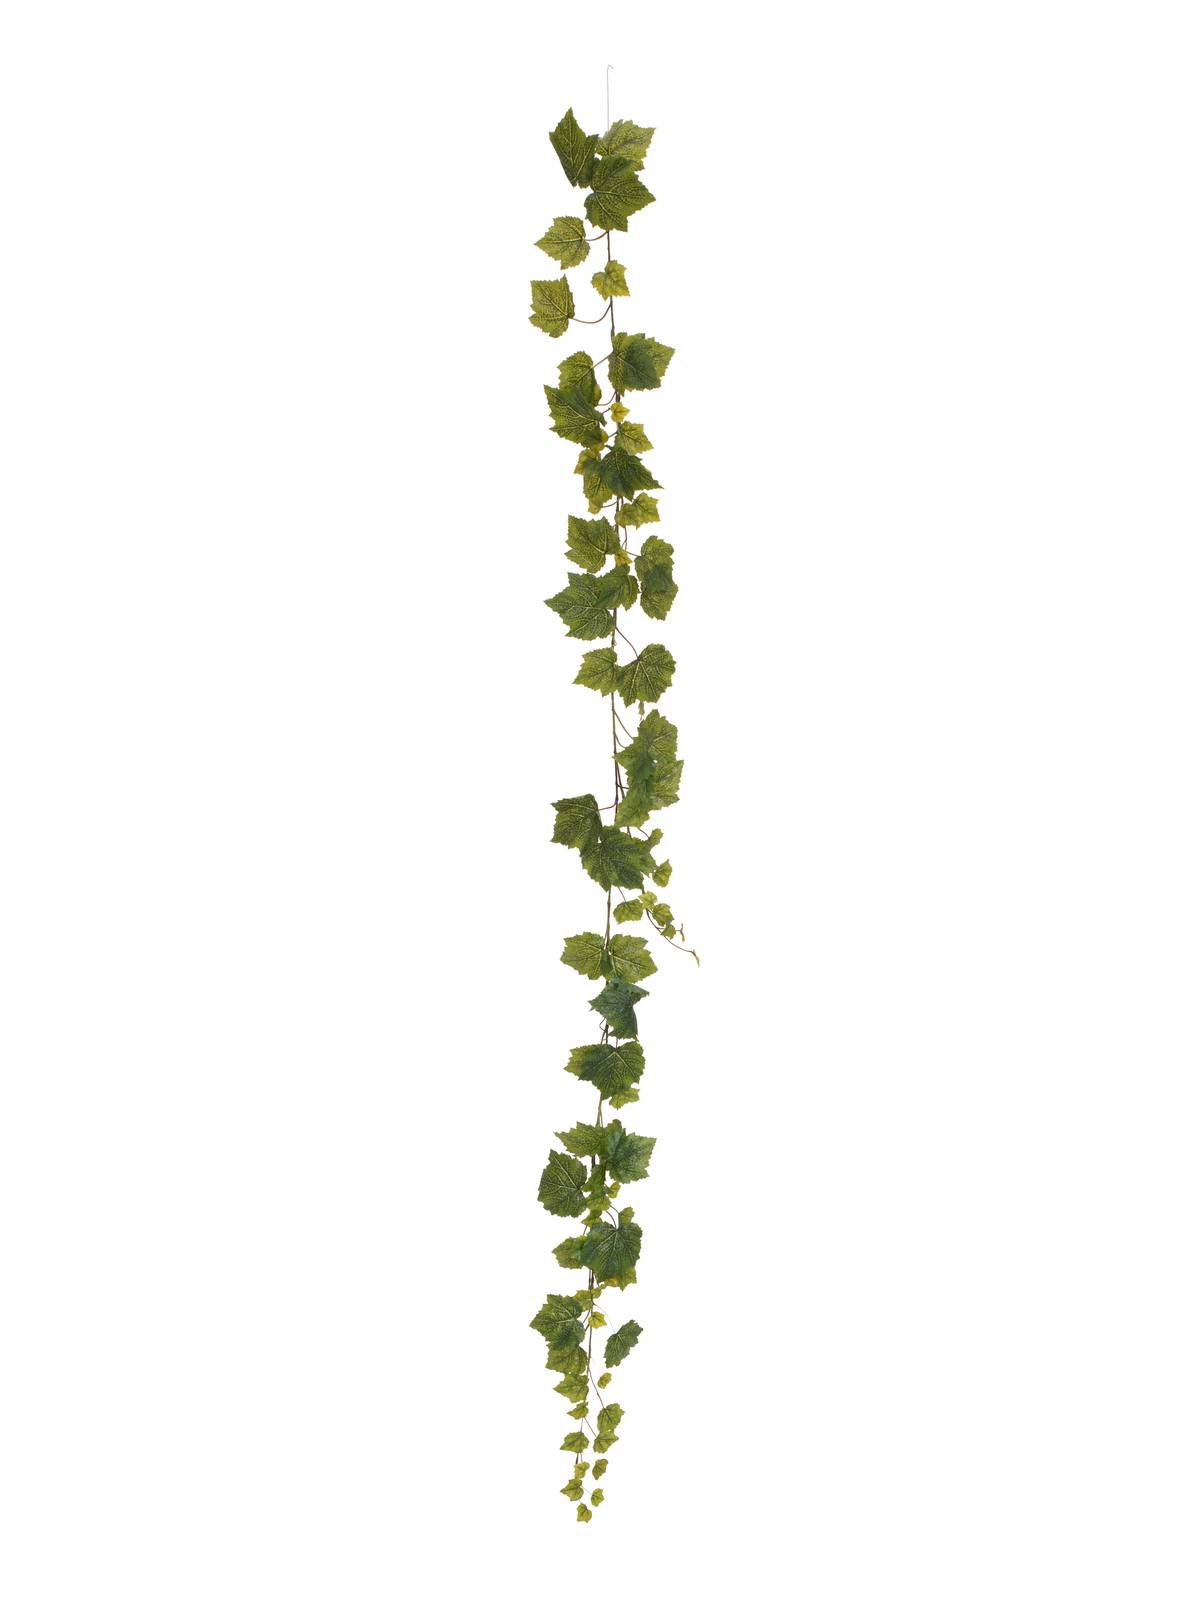 Girlanda z lístků vinné révy, Premium, 180 cm